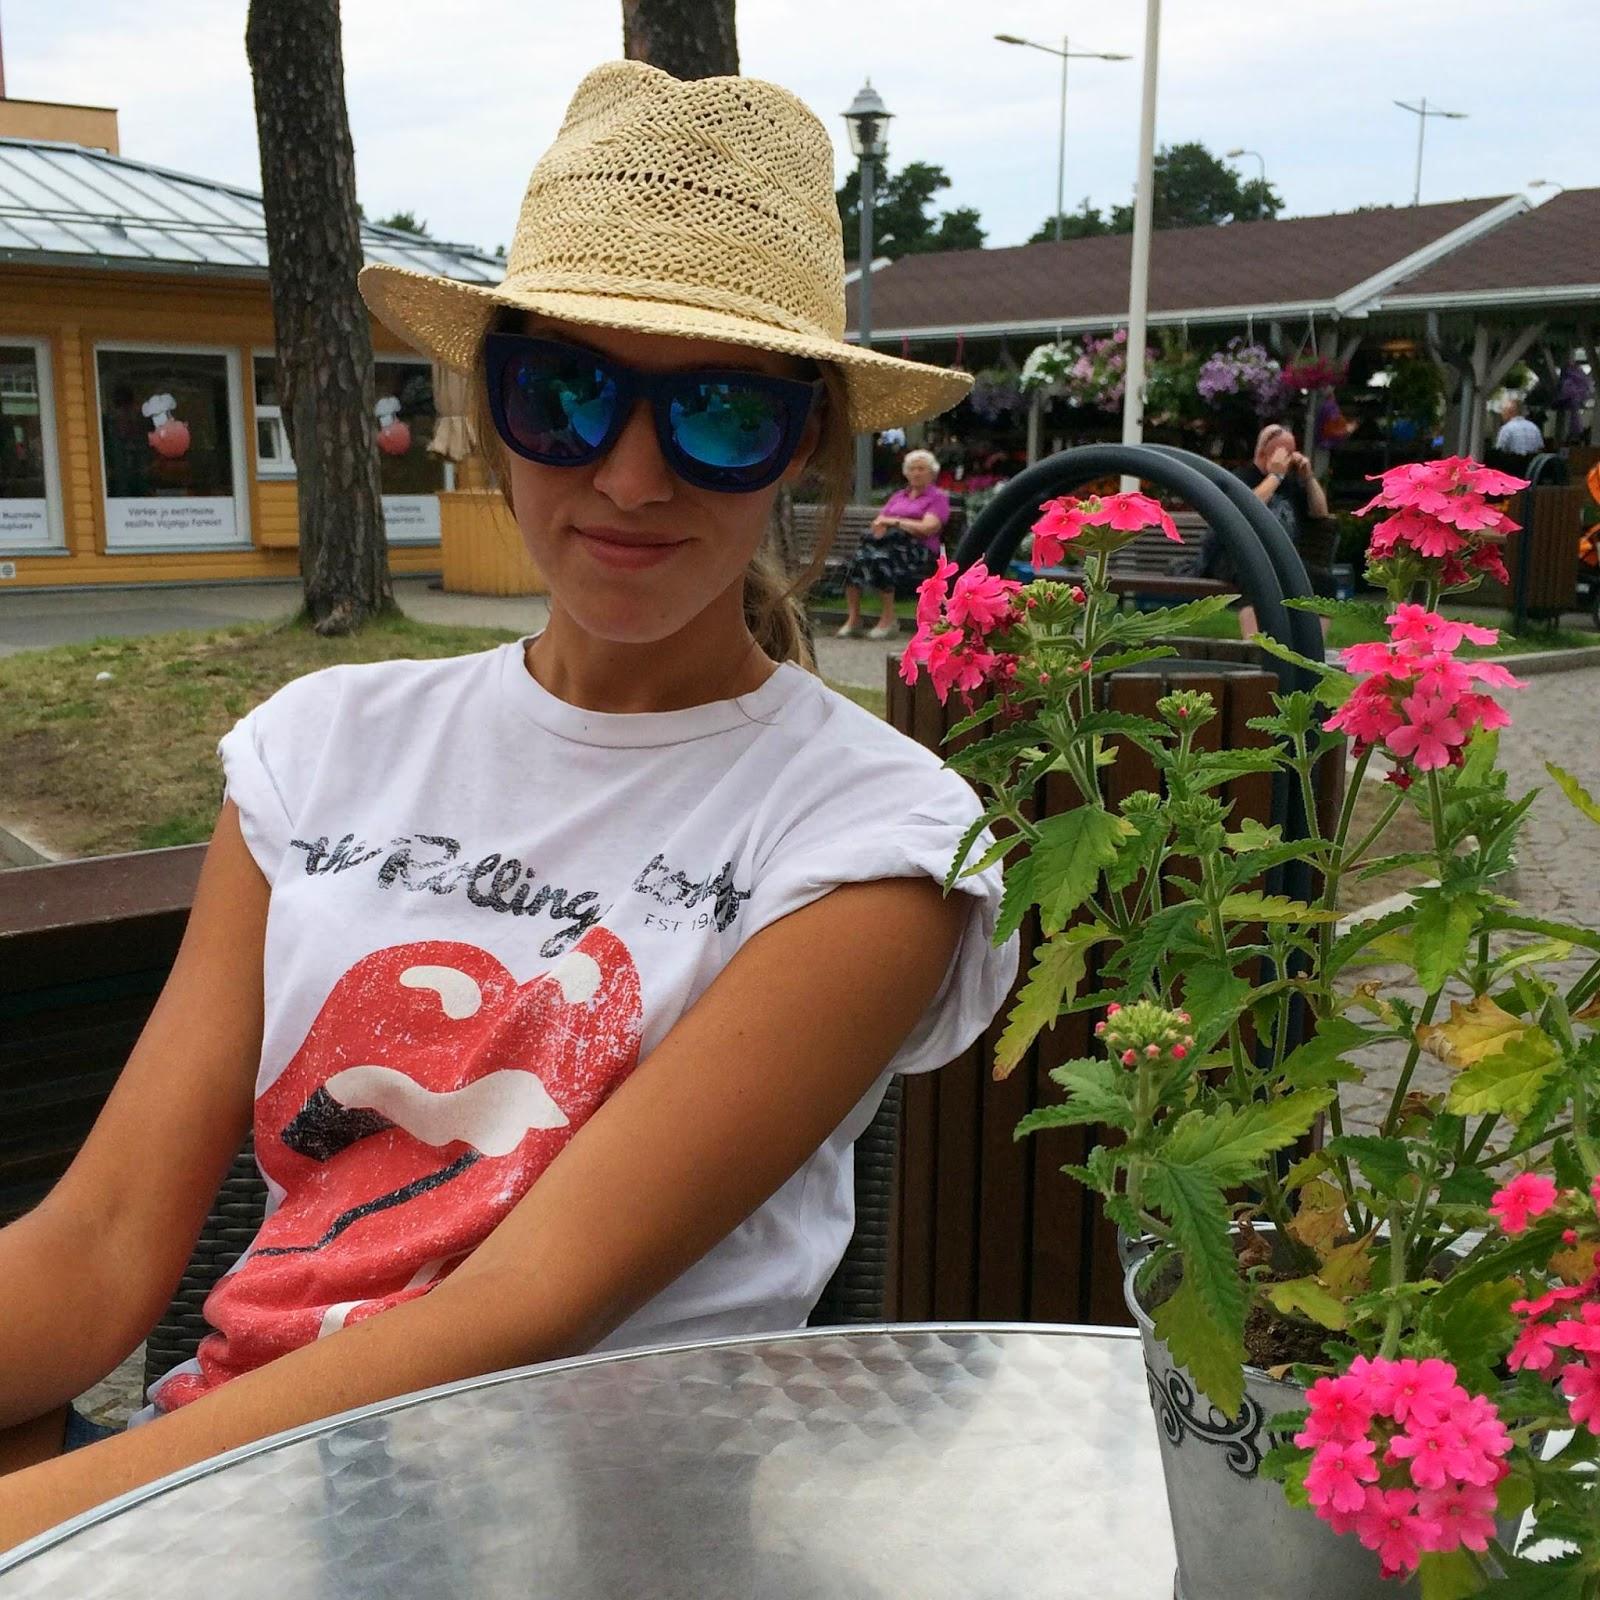 straw hat mirrored sunglasses rolling stones shirt